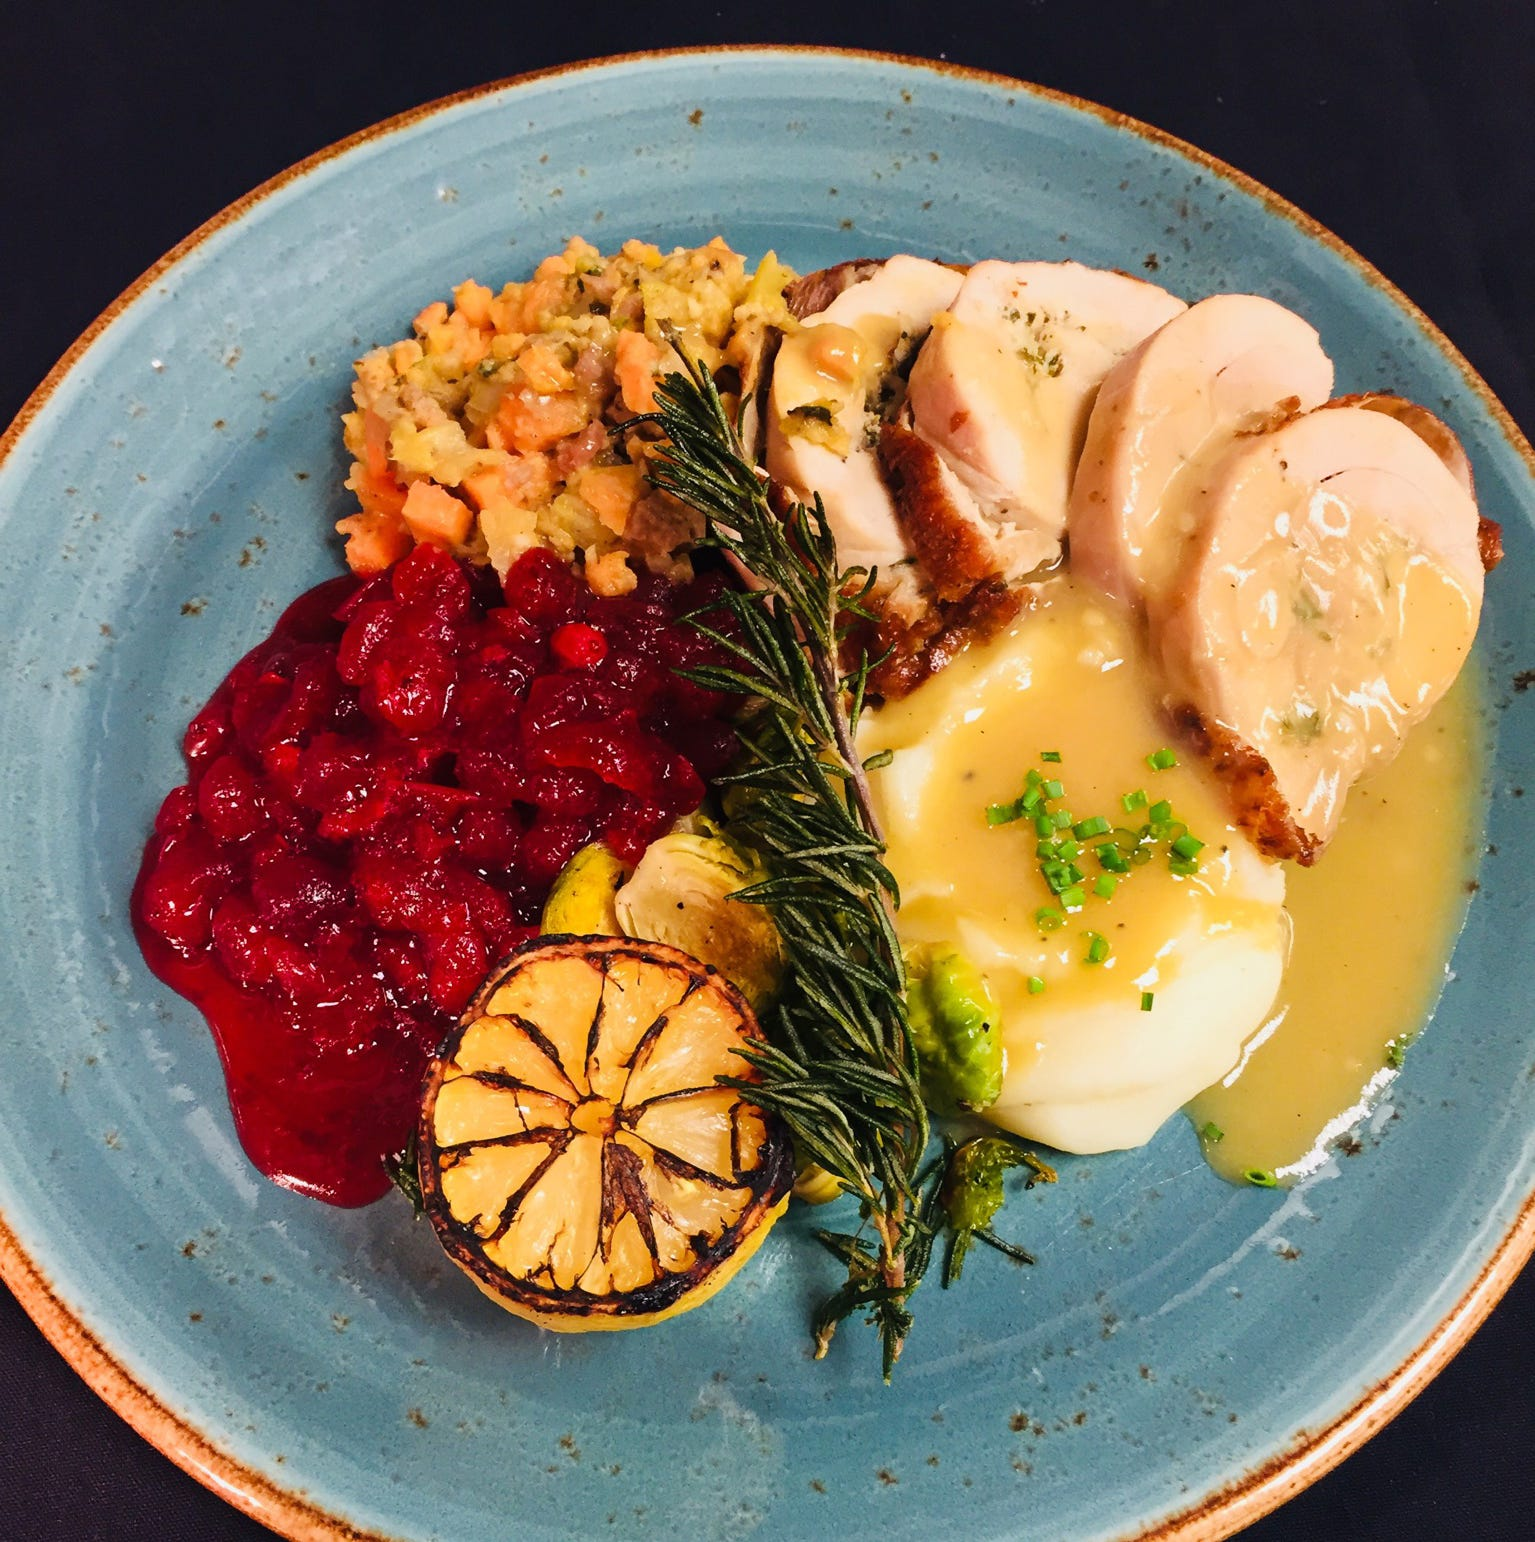 Turkey Porchetta will be one of the menu items at...